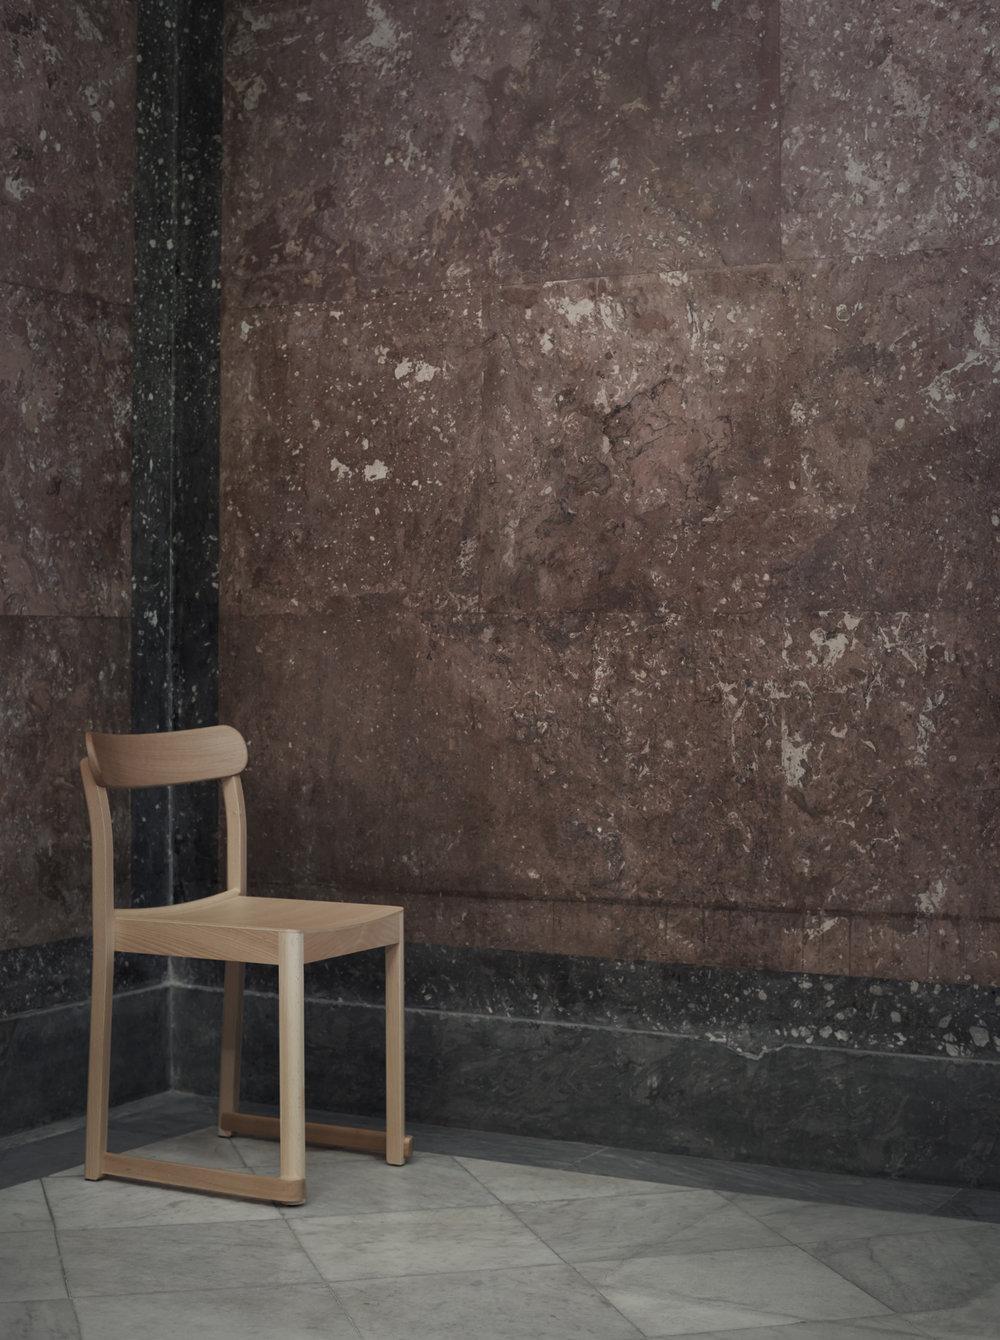 Artek_Atelier-Chair_natural_TAF_NM_photo_Nationalmuseum-Pia-Ulin.jpg